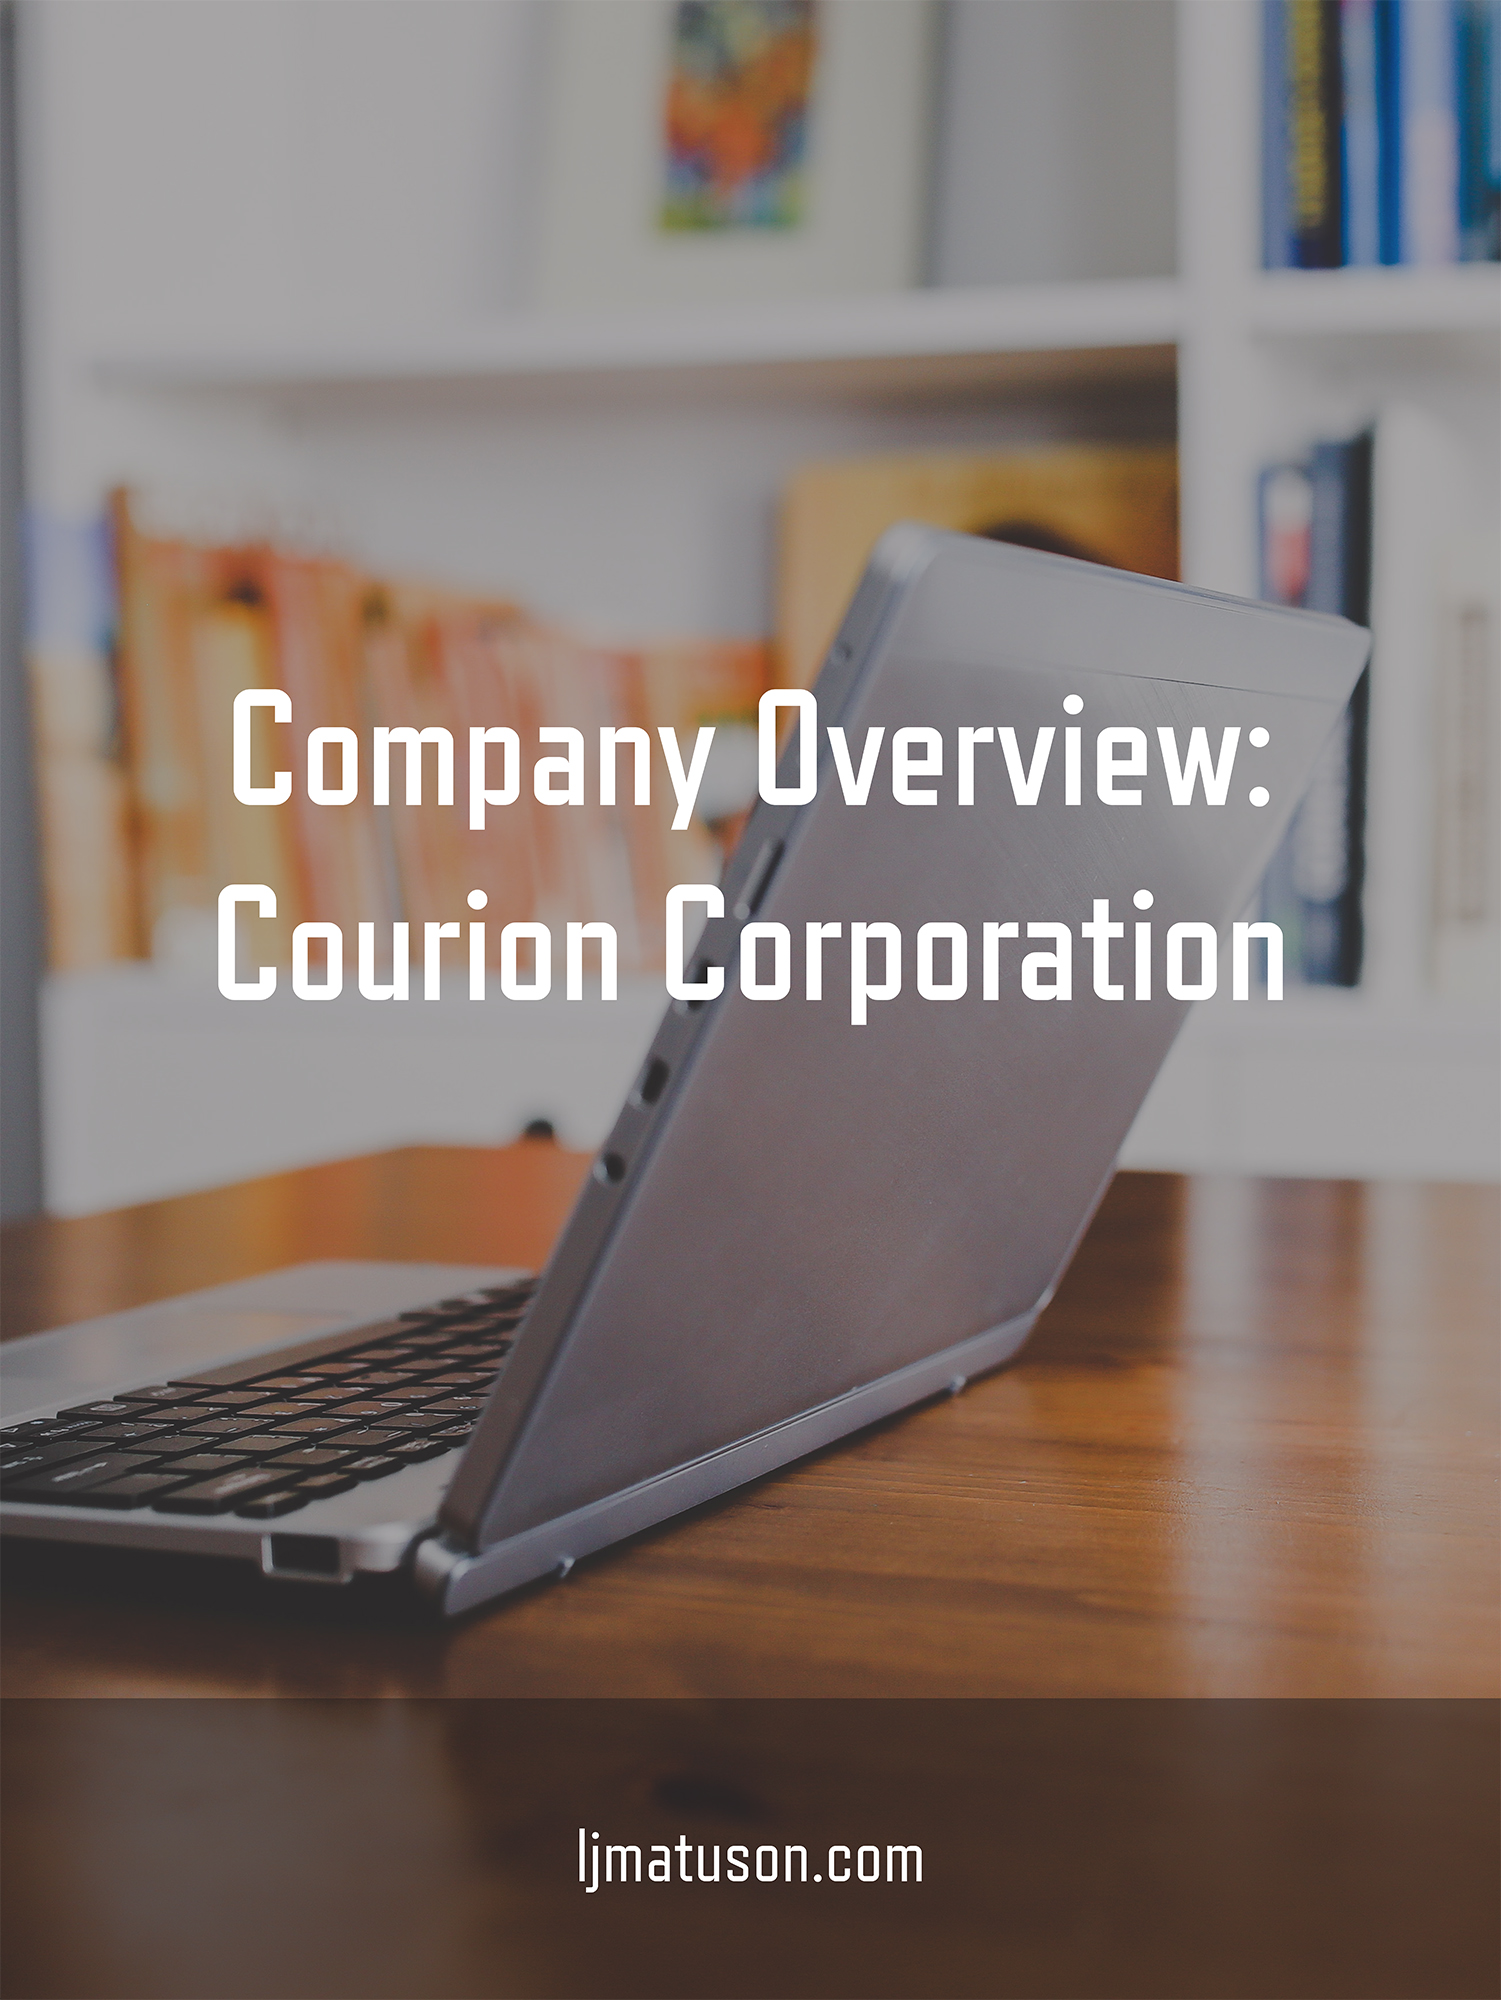 LeahMatuson_Courion-Company-Overview-02.jpg